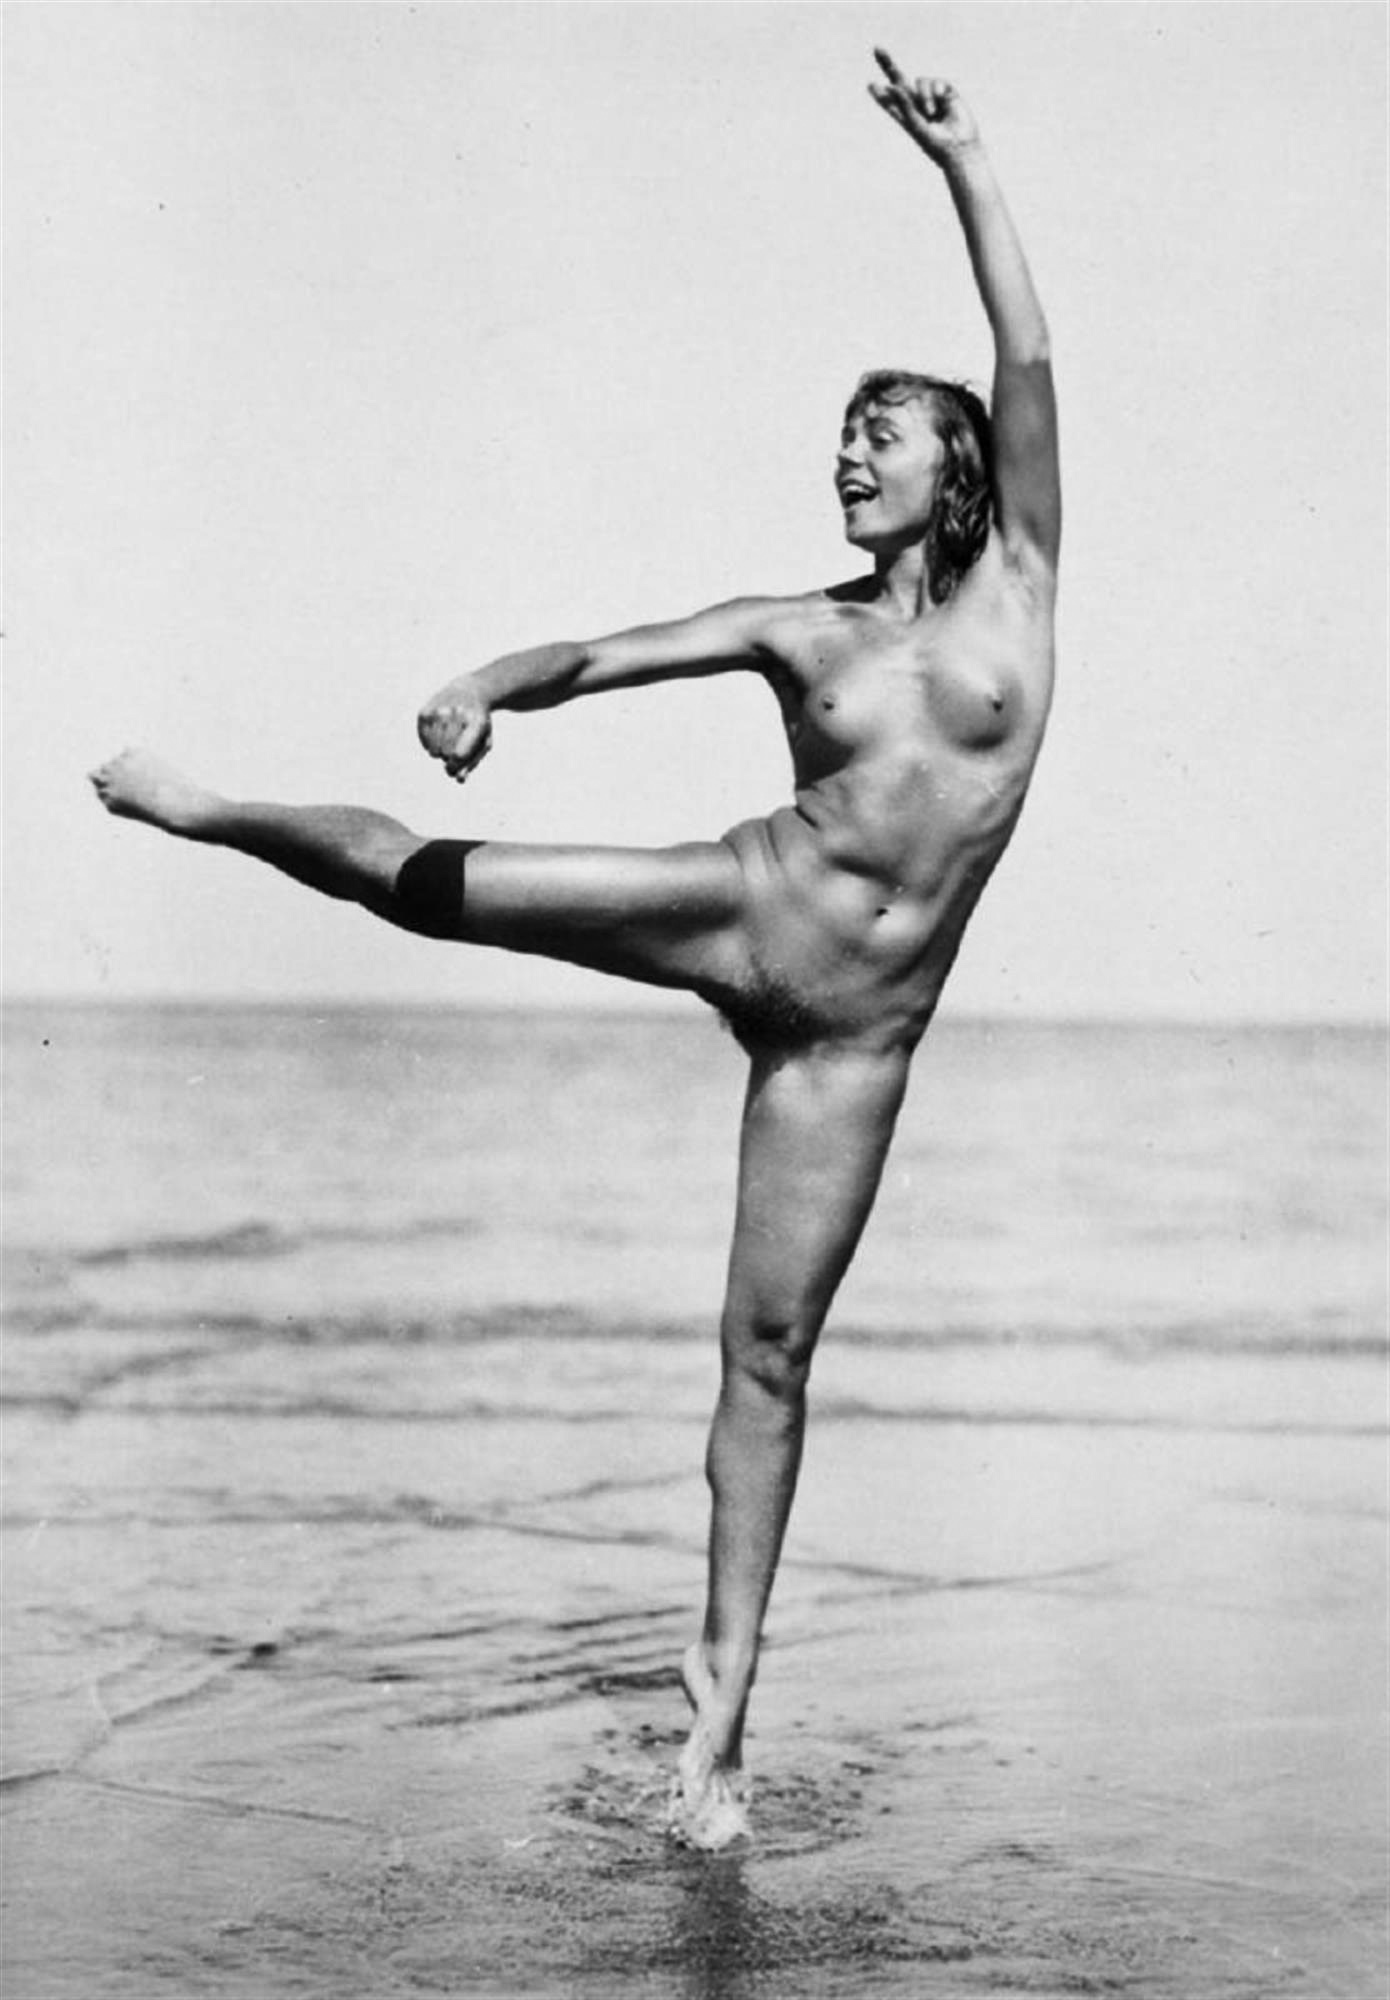 Gerhard Riebicke Ways to Strength and Beauty — DOP